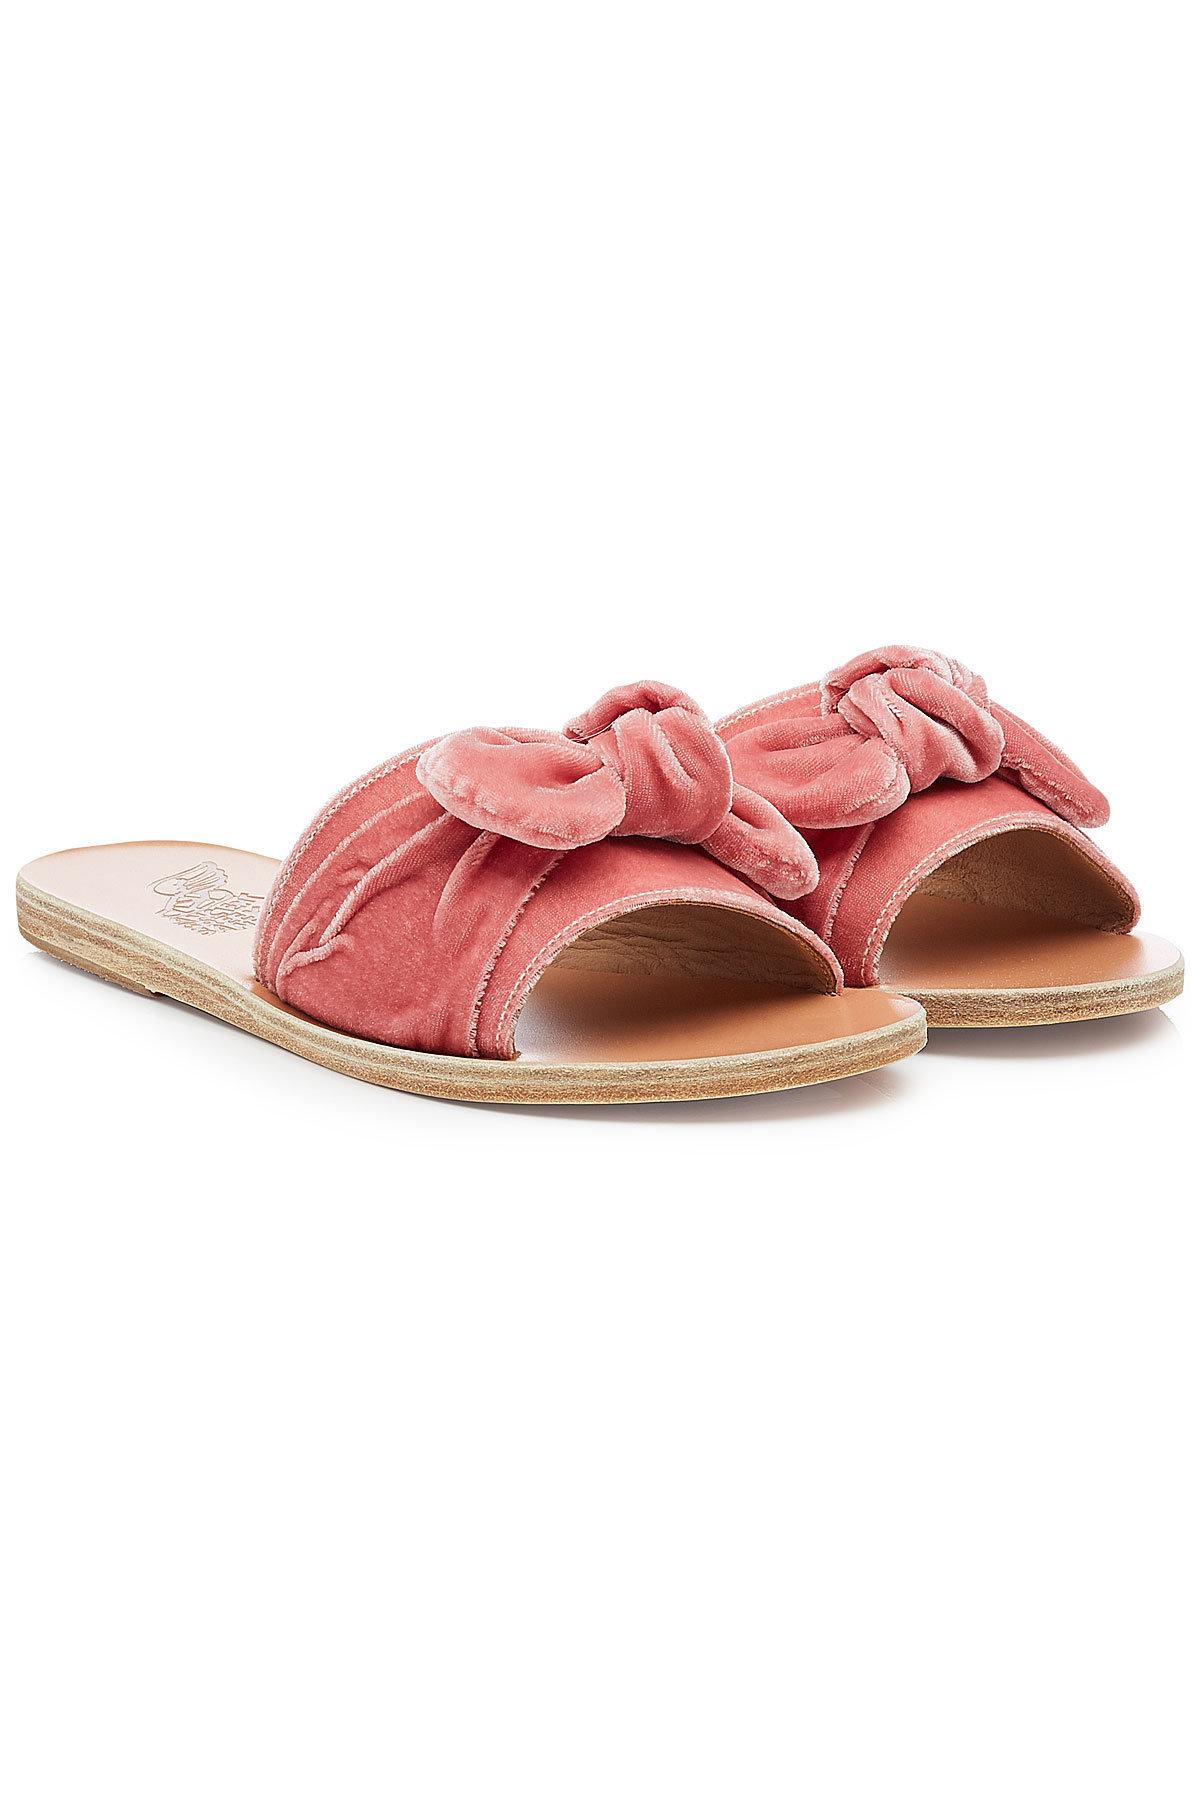 Ancient Greek Sandals Alkmini Woven Sandals Gr. IT 38 K9yPIbK